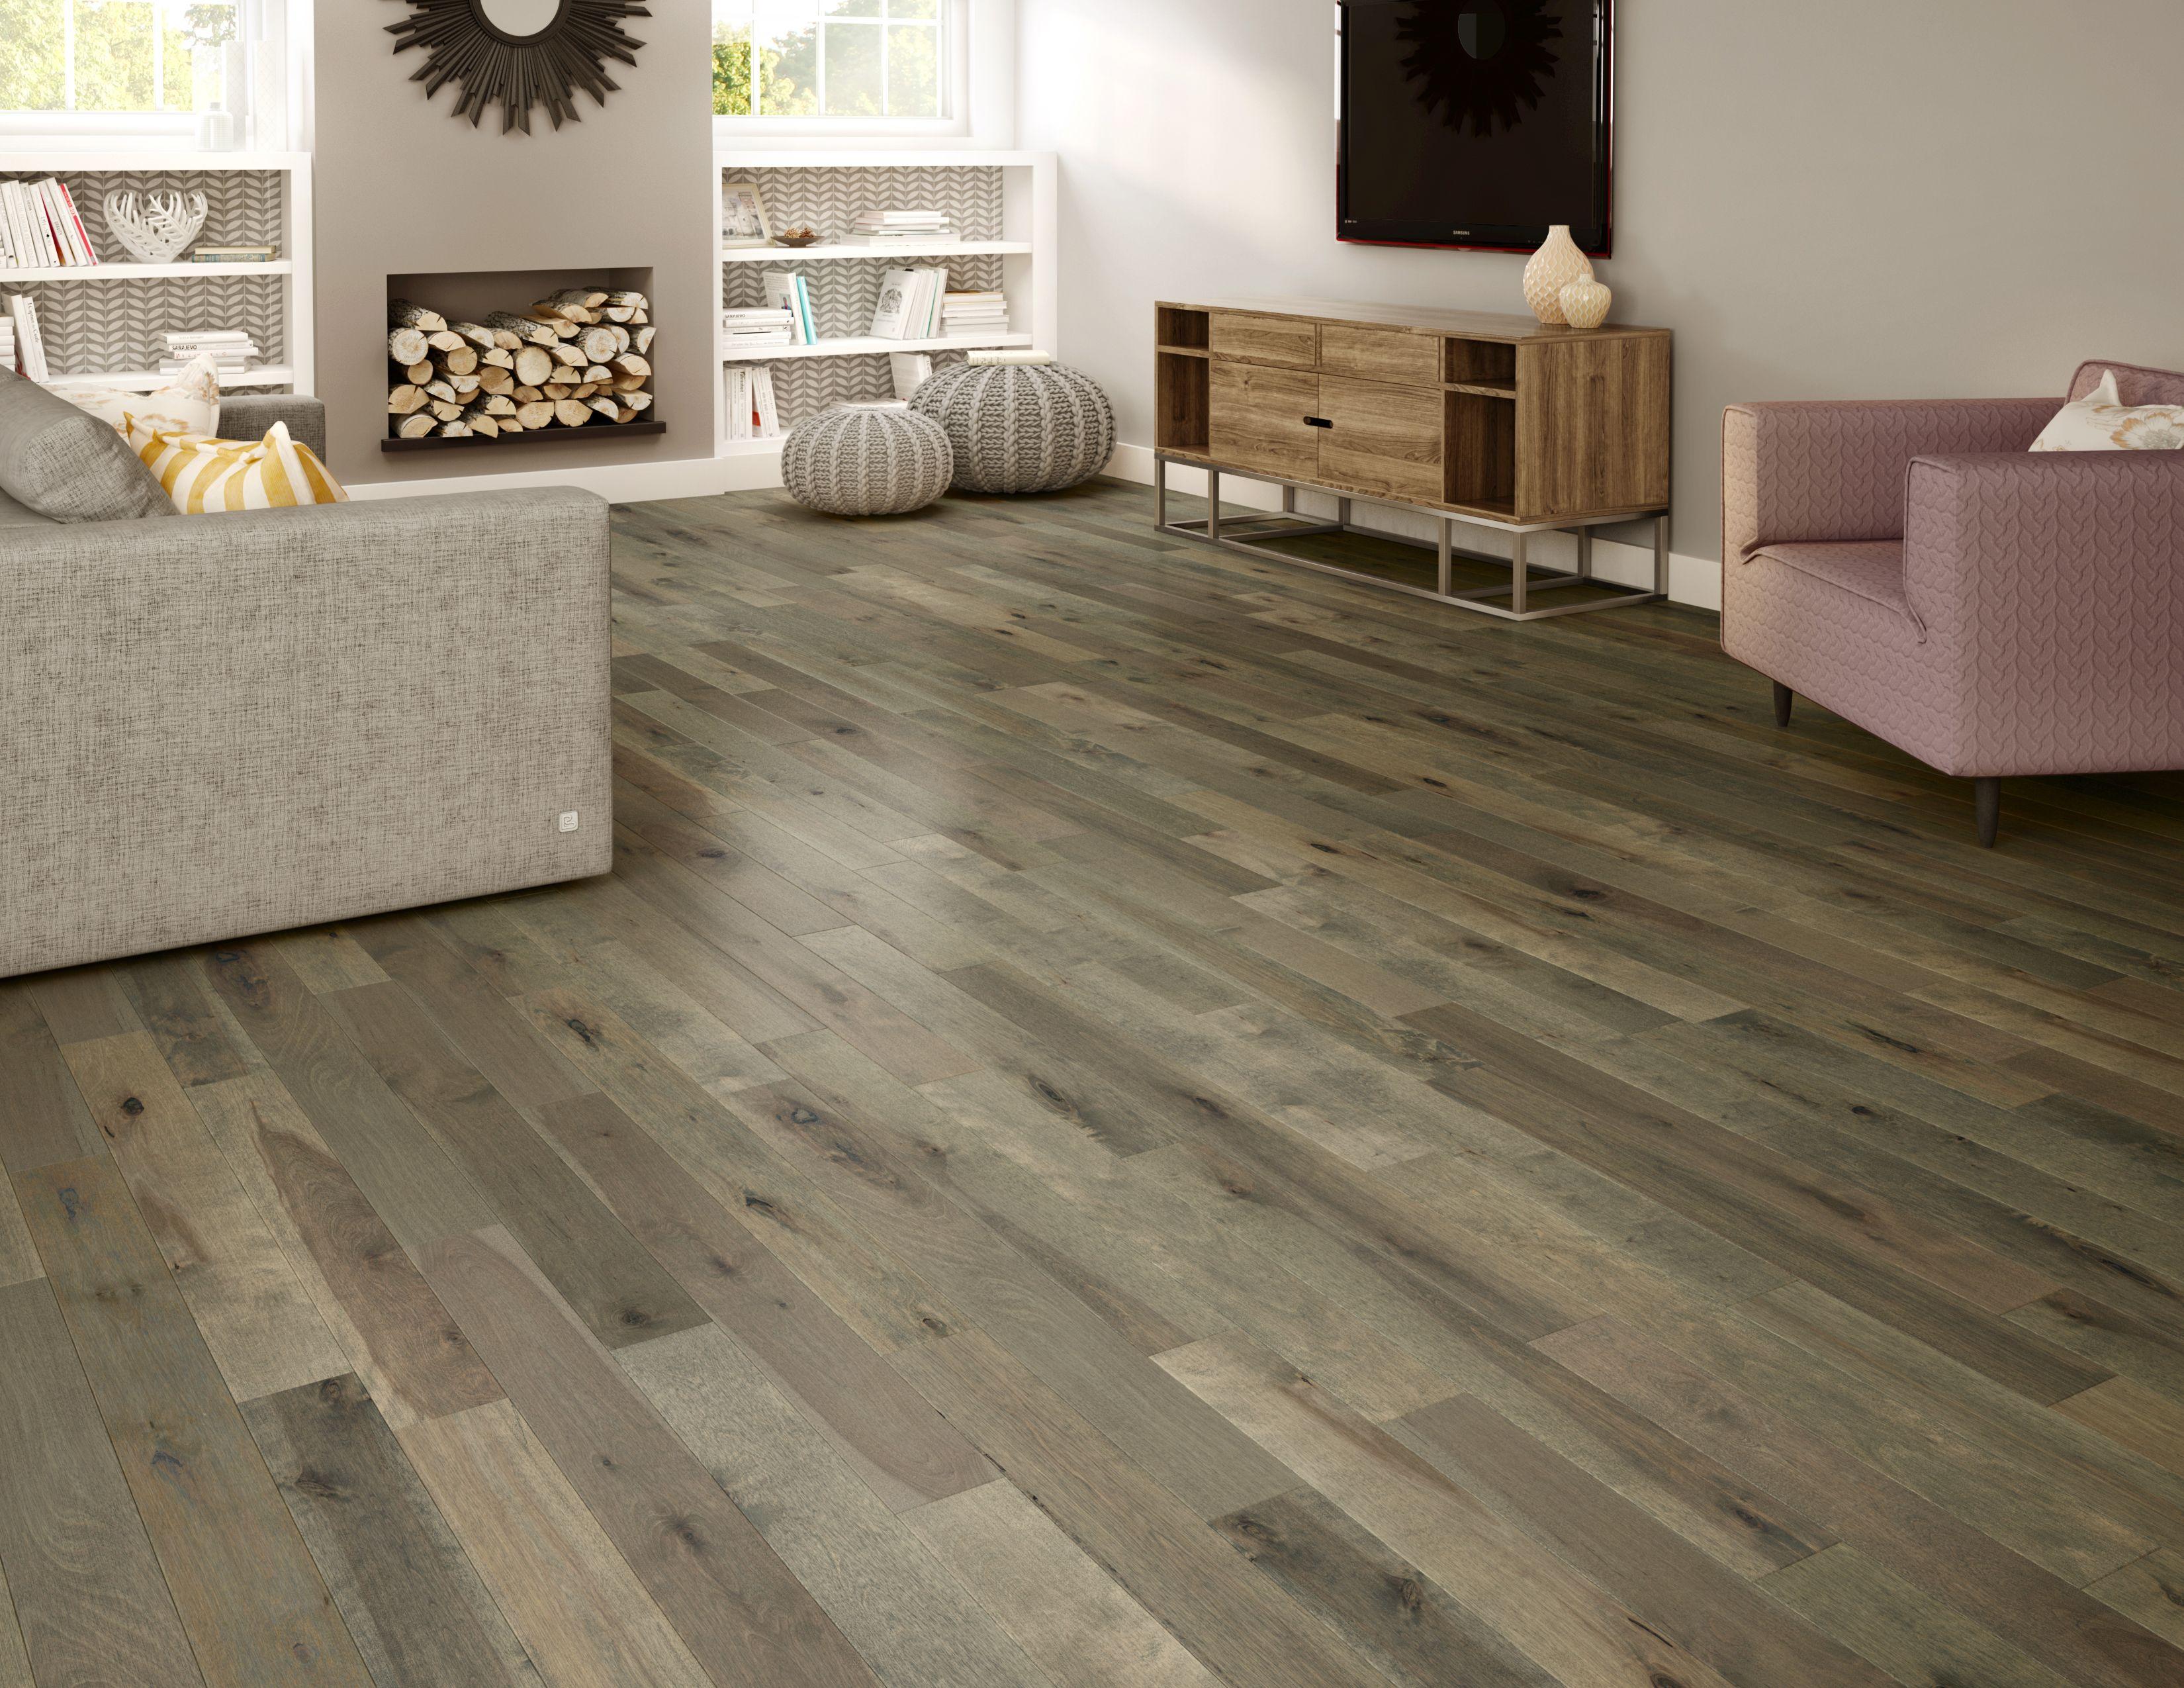 plancher de bois merisier preoil nougat yellow birch. Black Bedroom Furniture Sets. Home Design Ideas